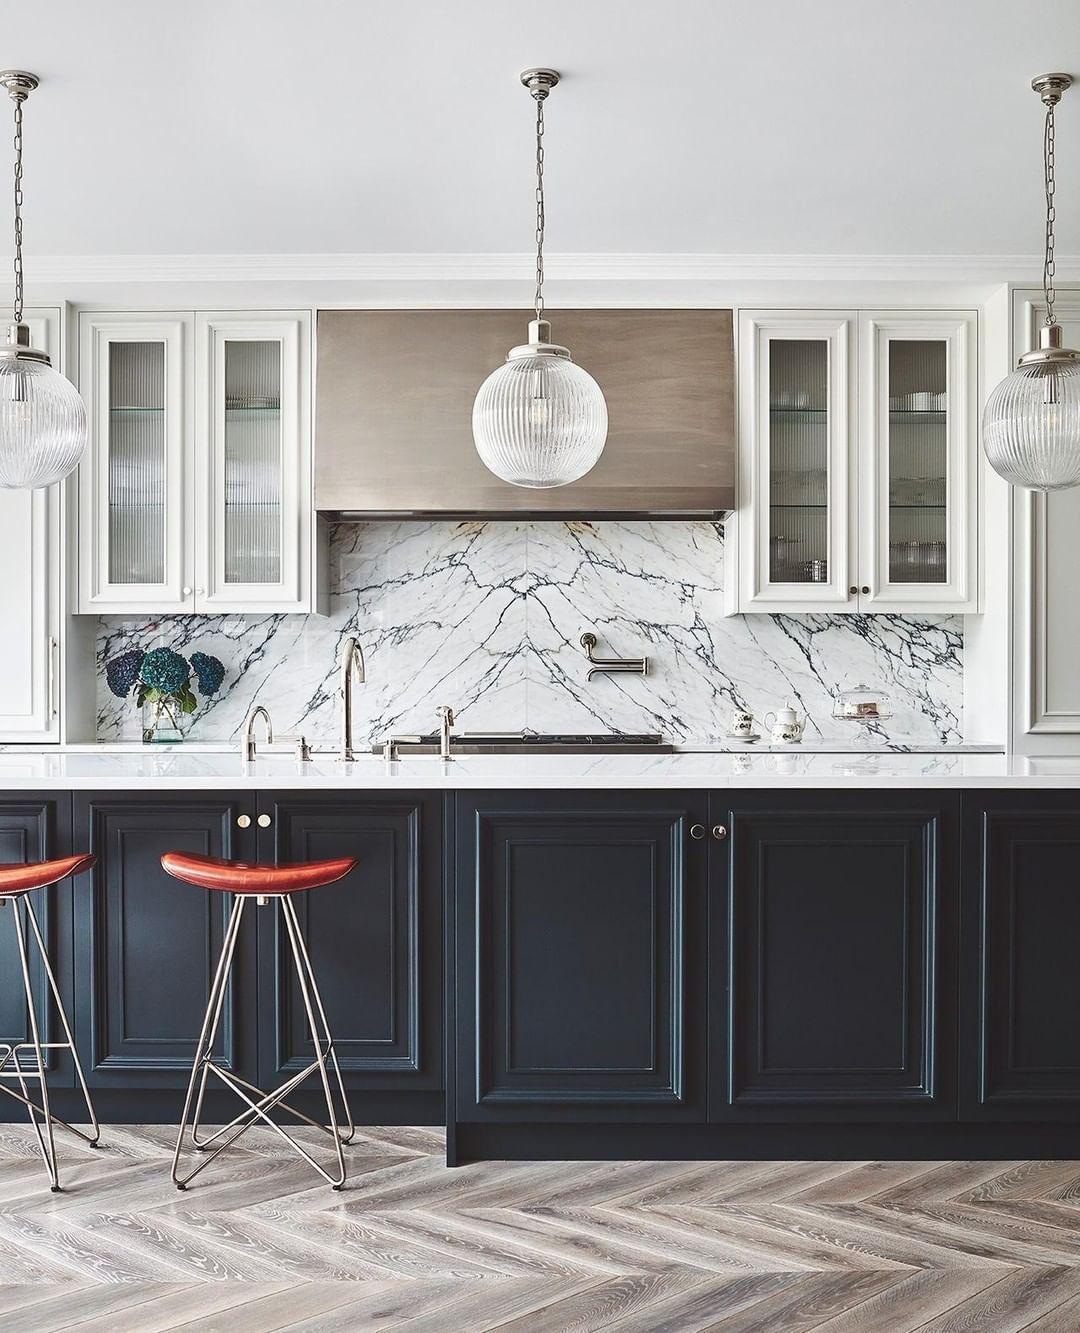 "Blakes London on Instagram ""This kitchen began as a reiteration ..."